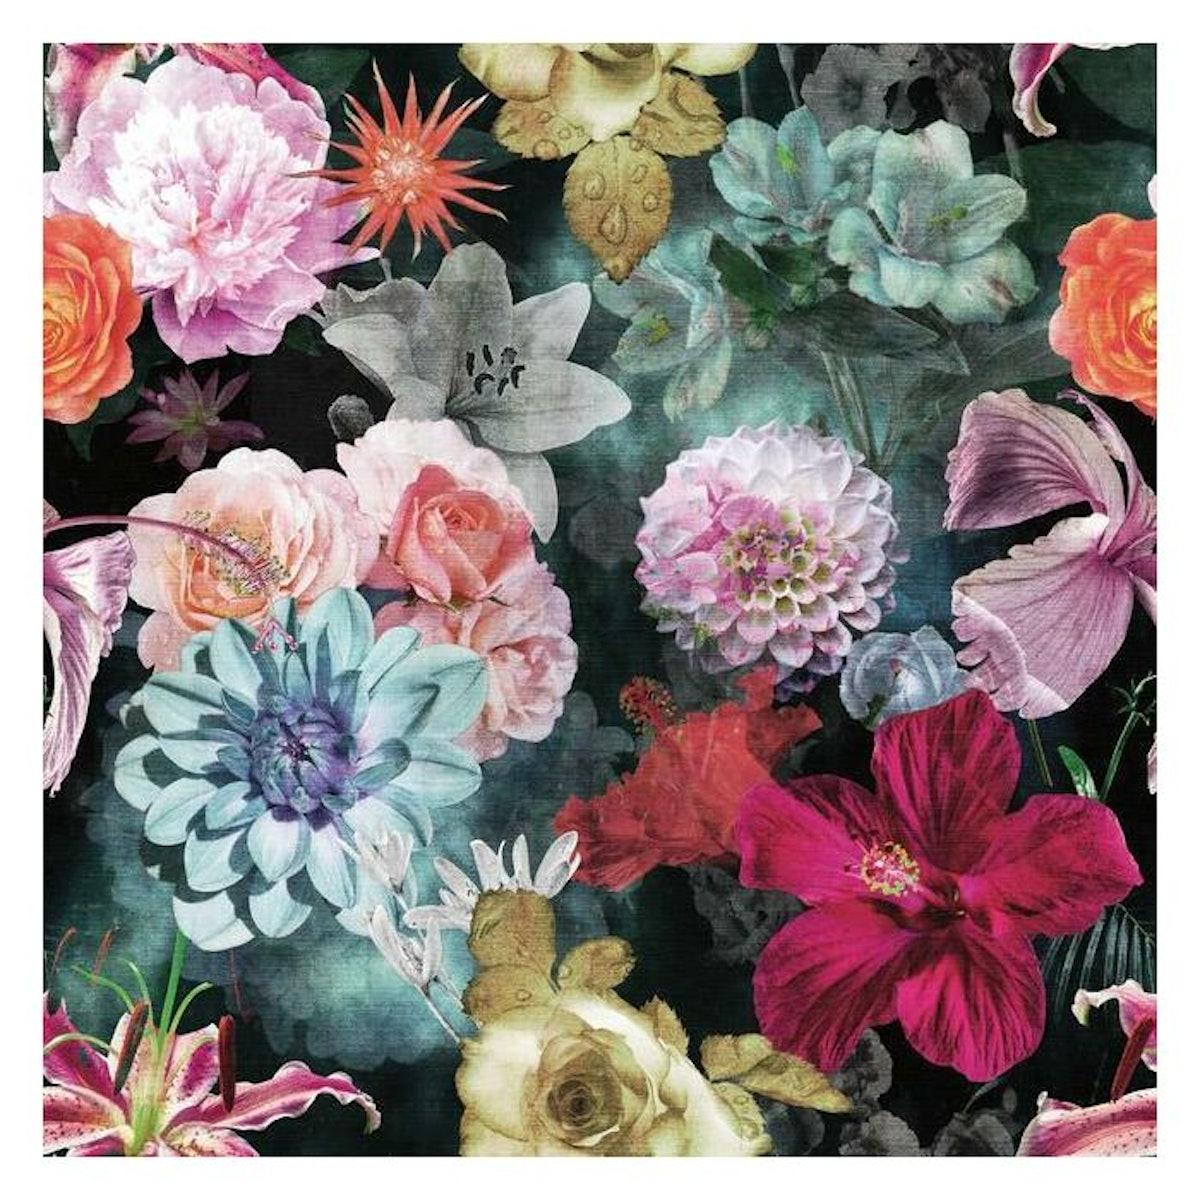 Vintage Floral Bloom Peel and Stick Wallpaper